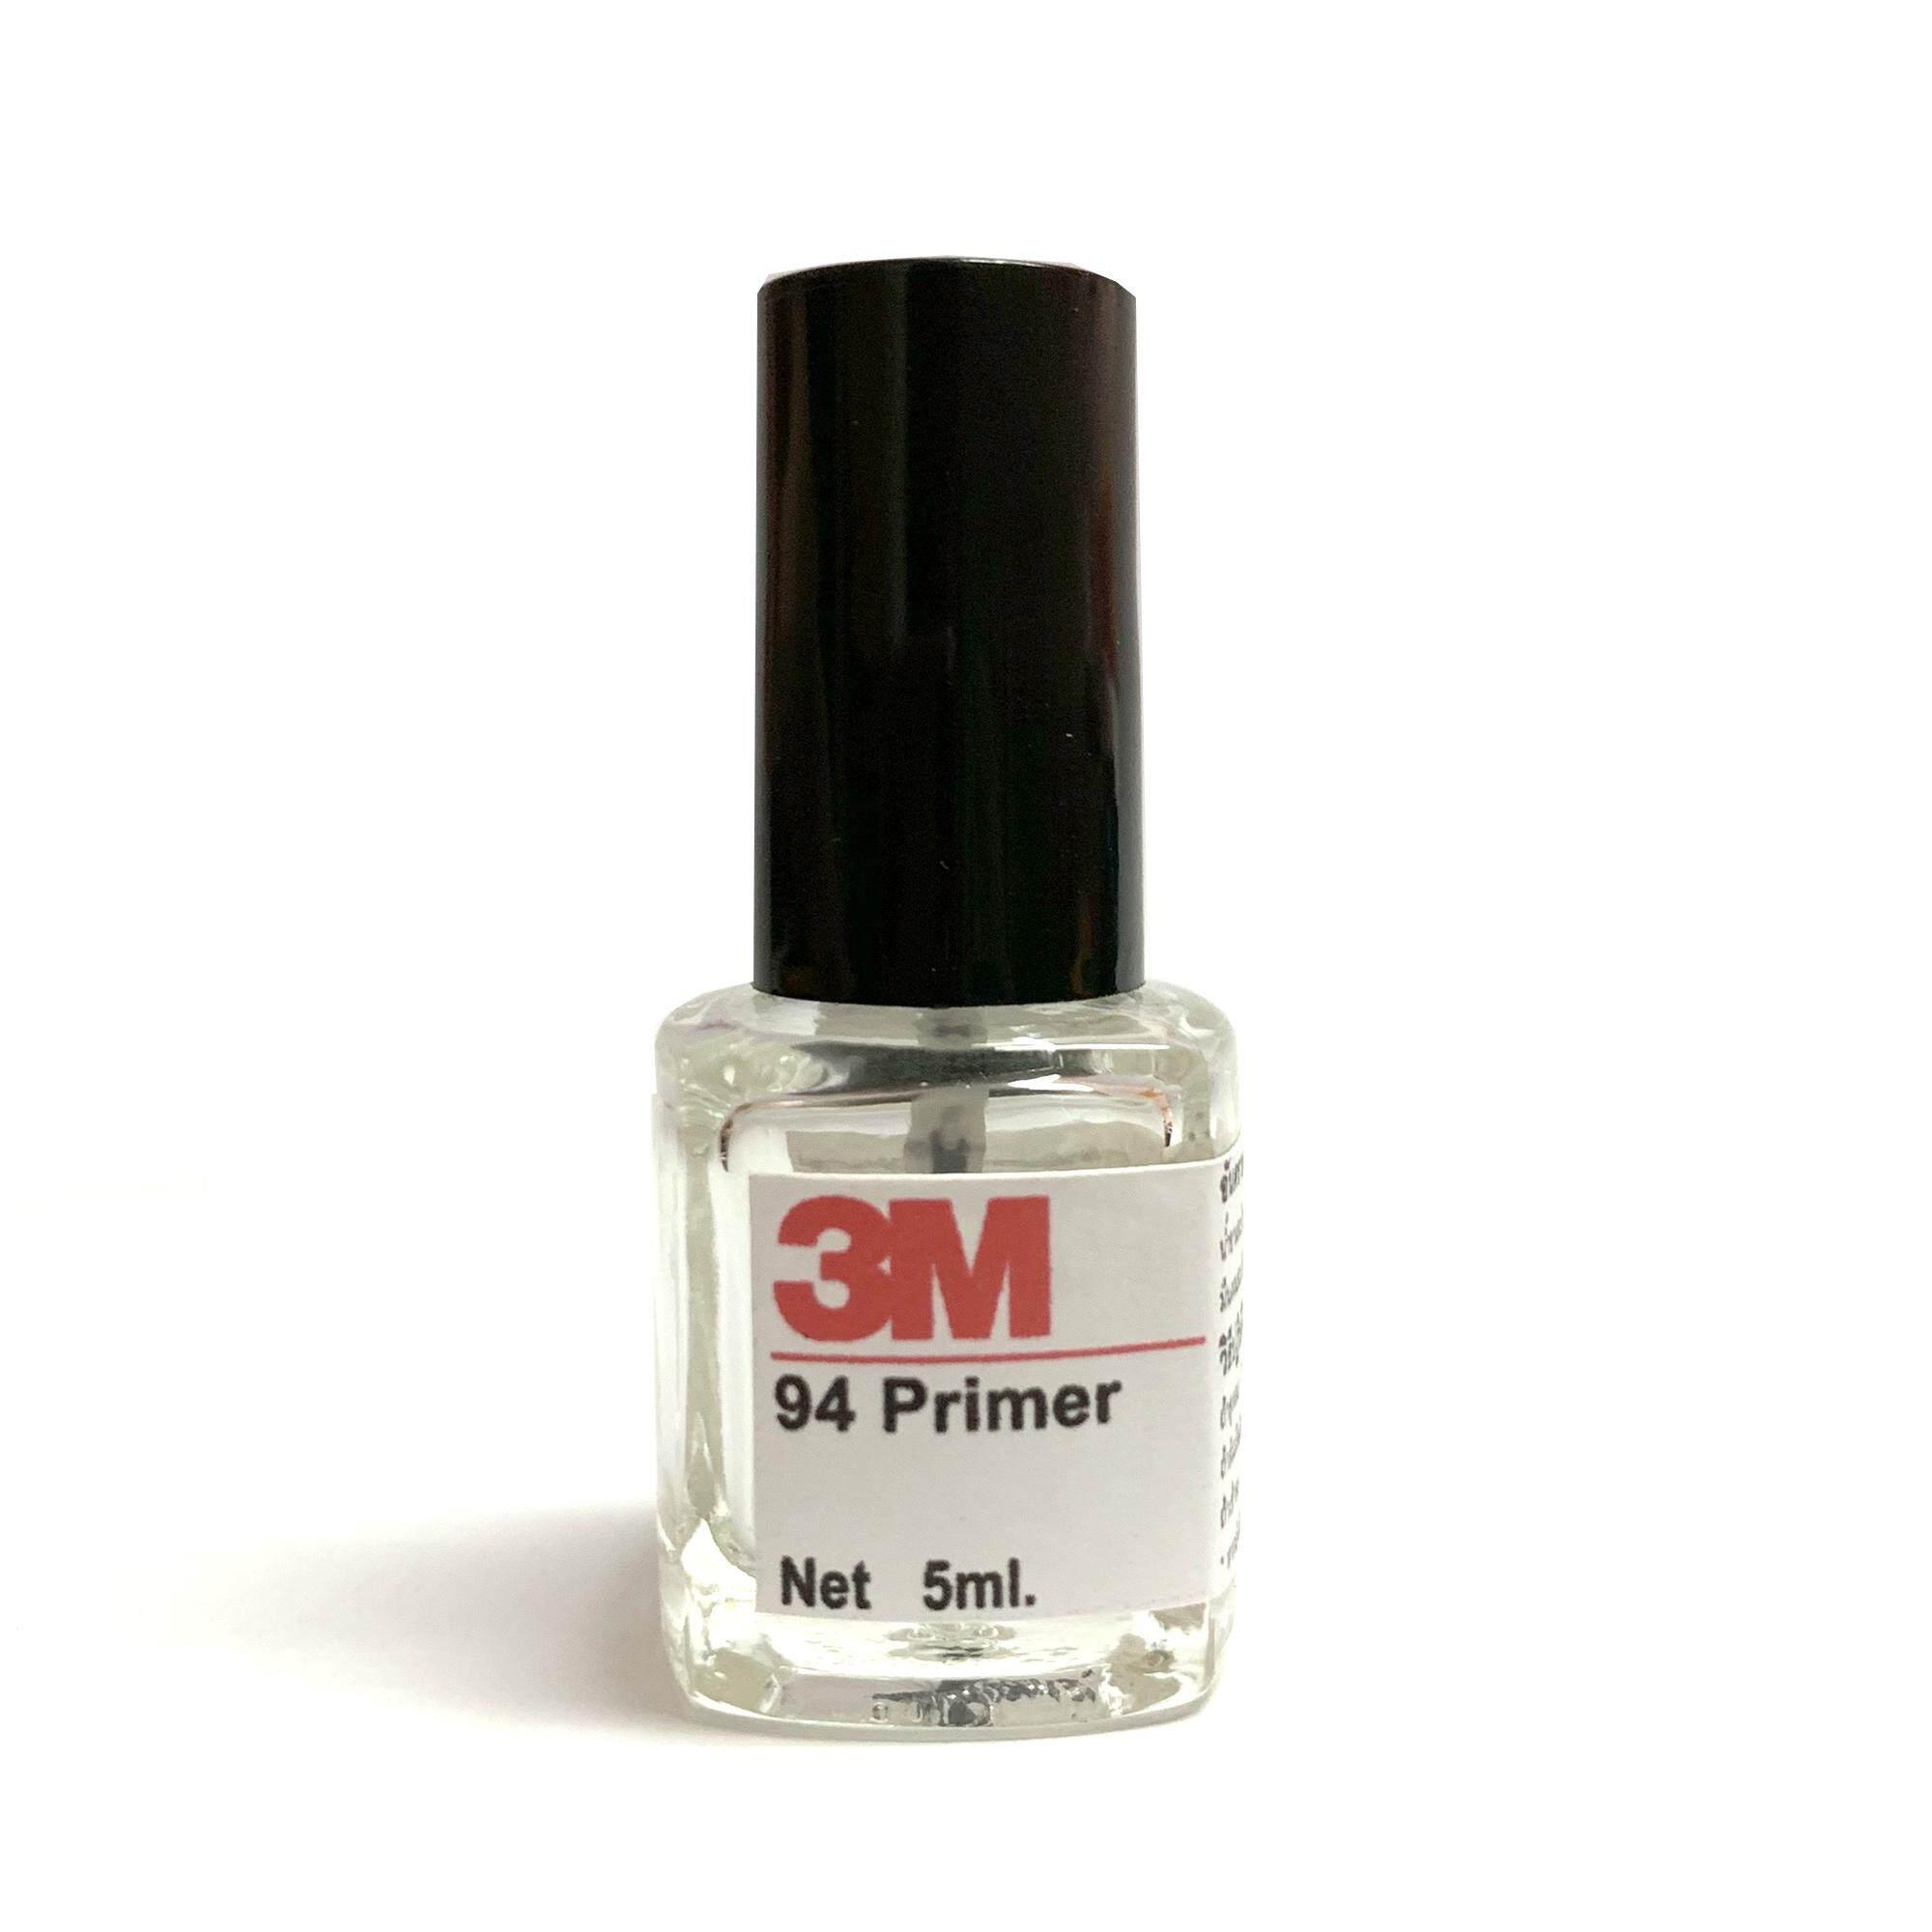 3m Primer 94 น้ำยาช่วยการยึดเกาะผิวขอบงานสติกเกอร์ (5ml.) By Somany Cosmetic.